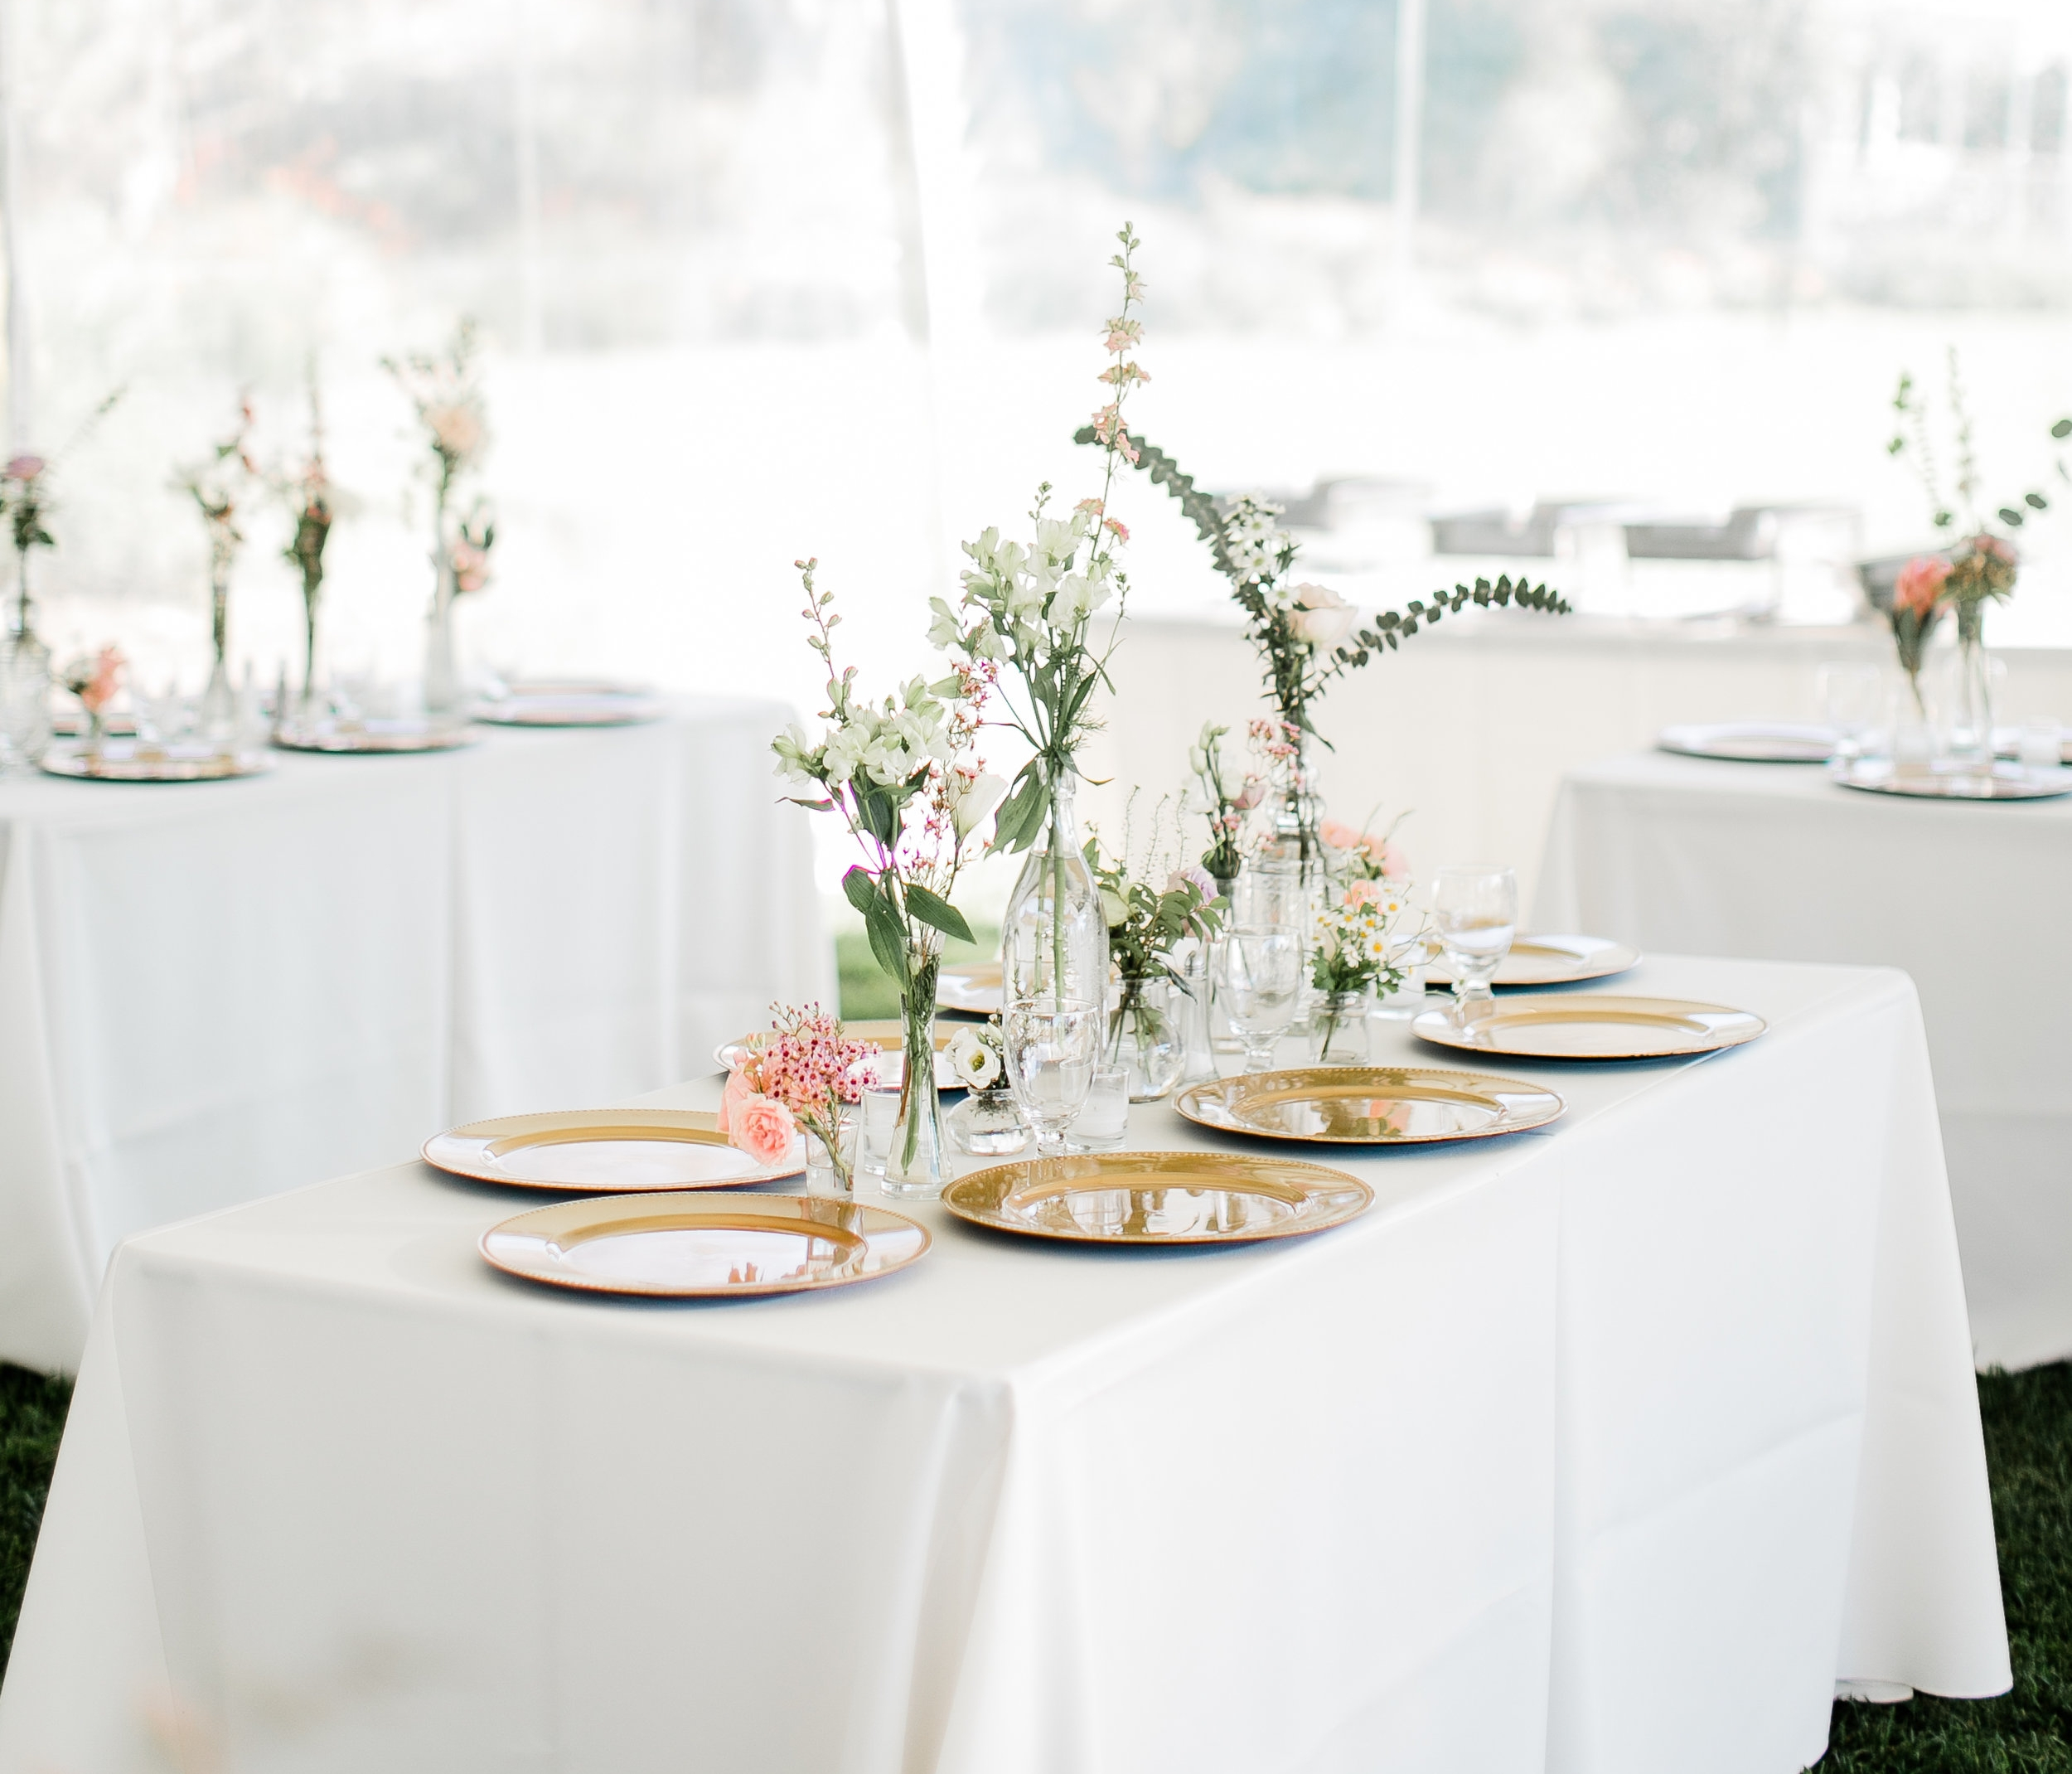 South-Coast-Botanic-Garden-Wedding-Planner8.jpg